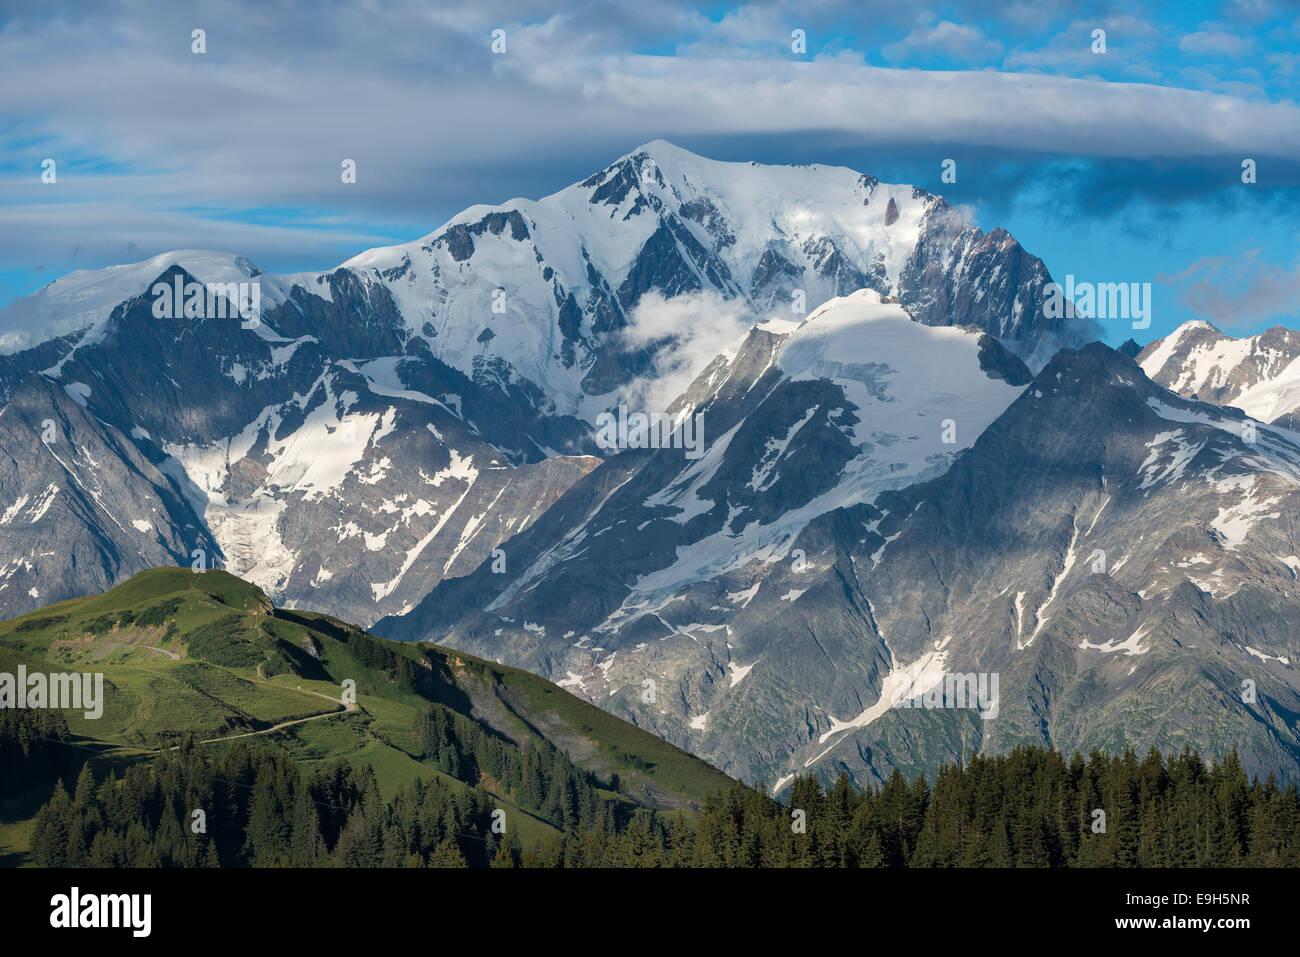 Mont Blanc massif, Hauteluce, Rhône-Alpes, France - Stock Image